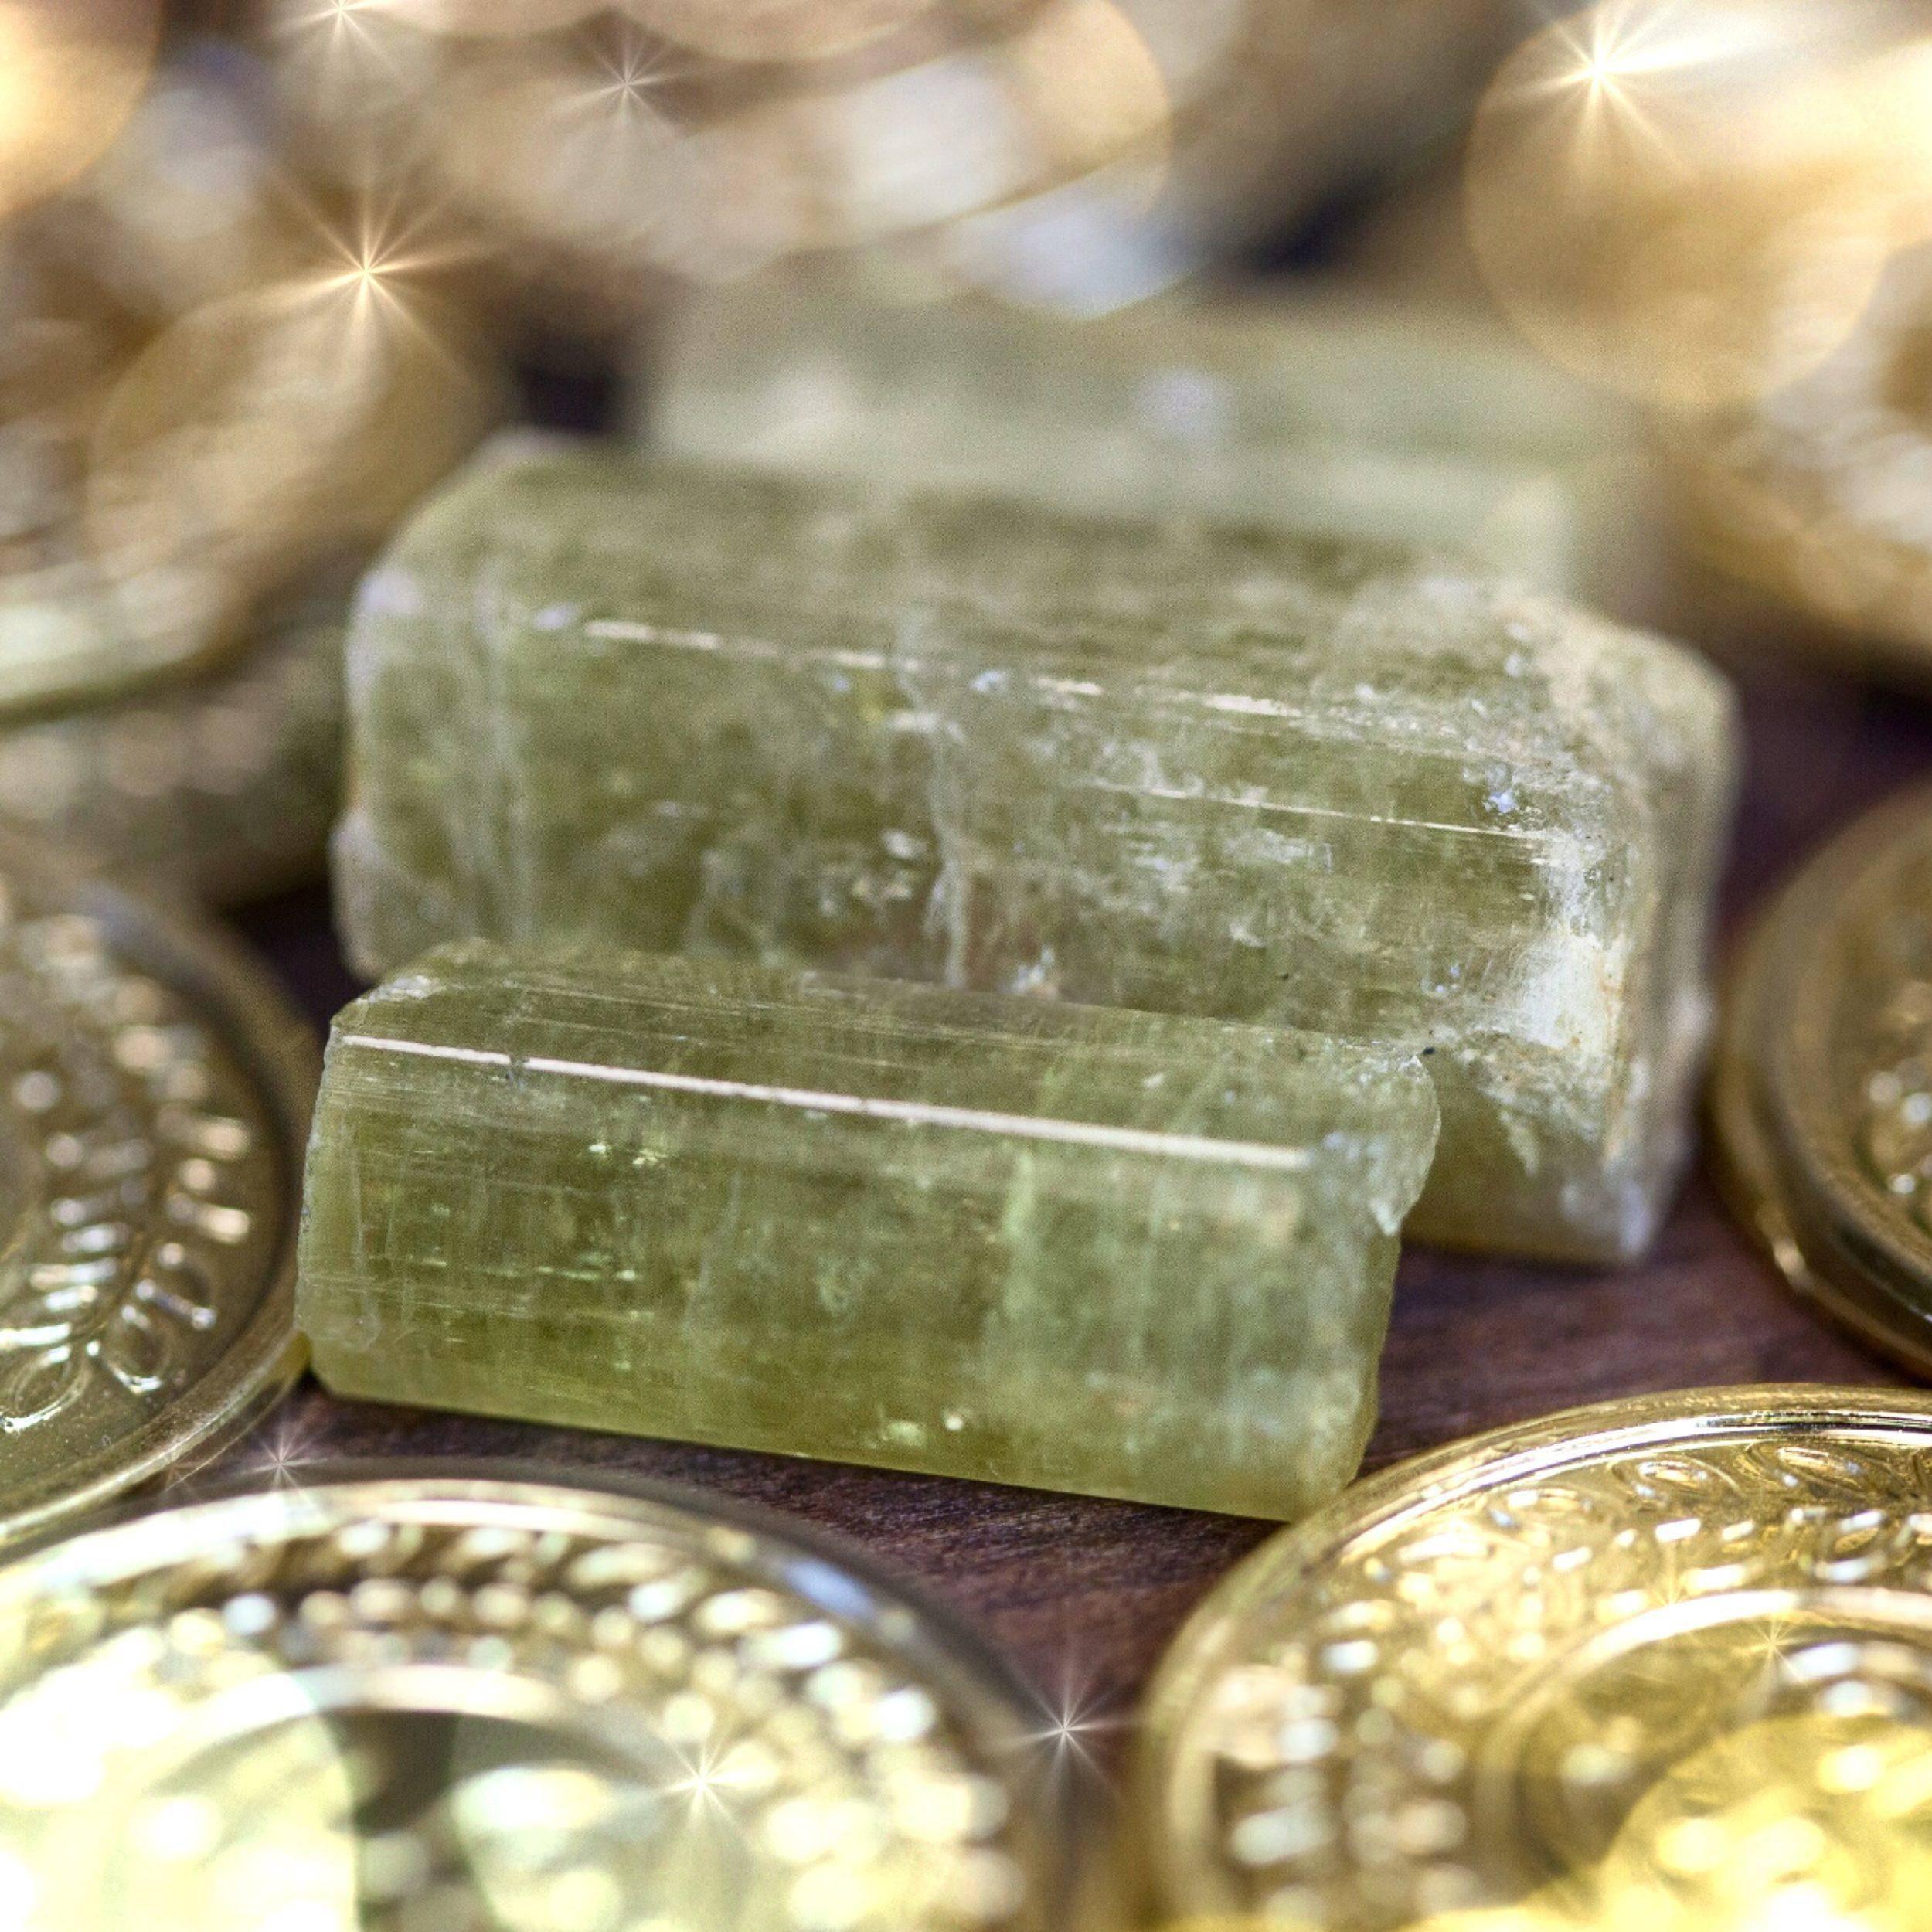 Mega Abundance Crystals anointed with Mega Money Perfume 2